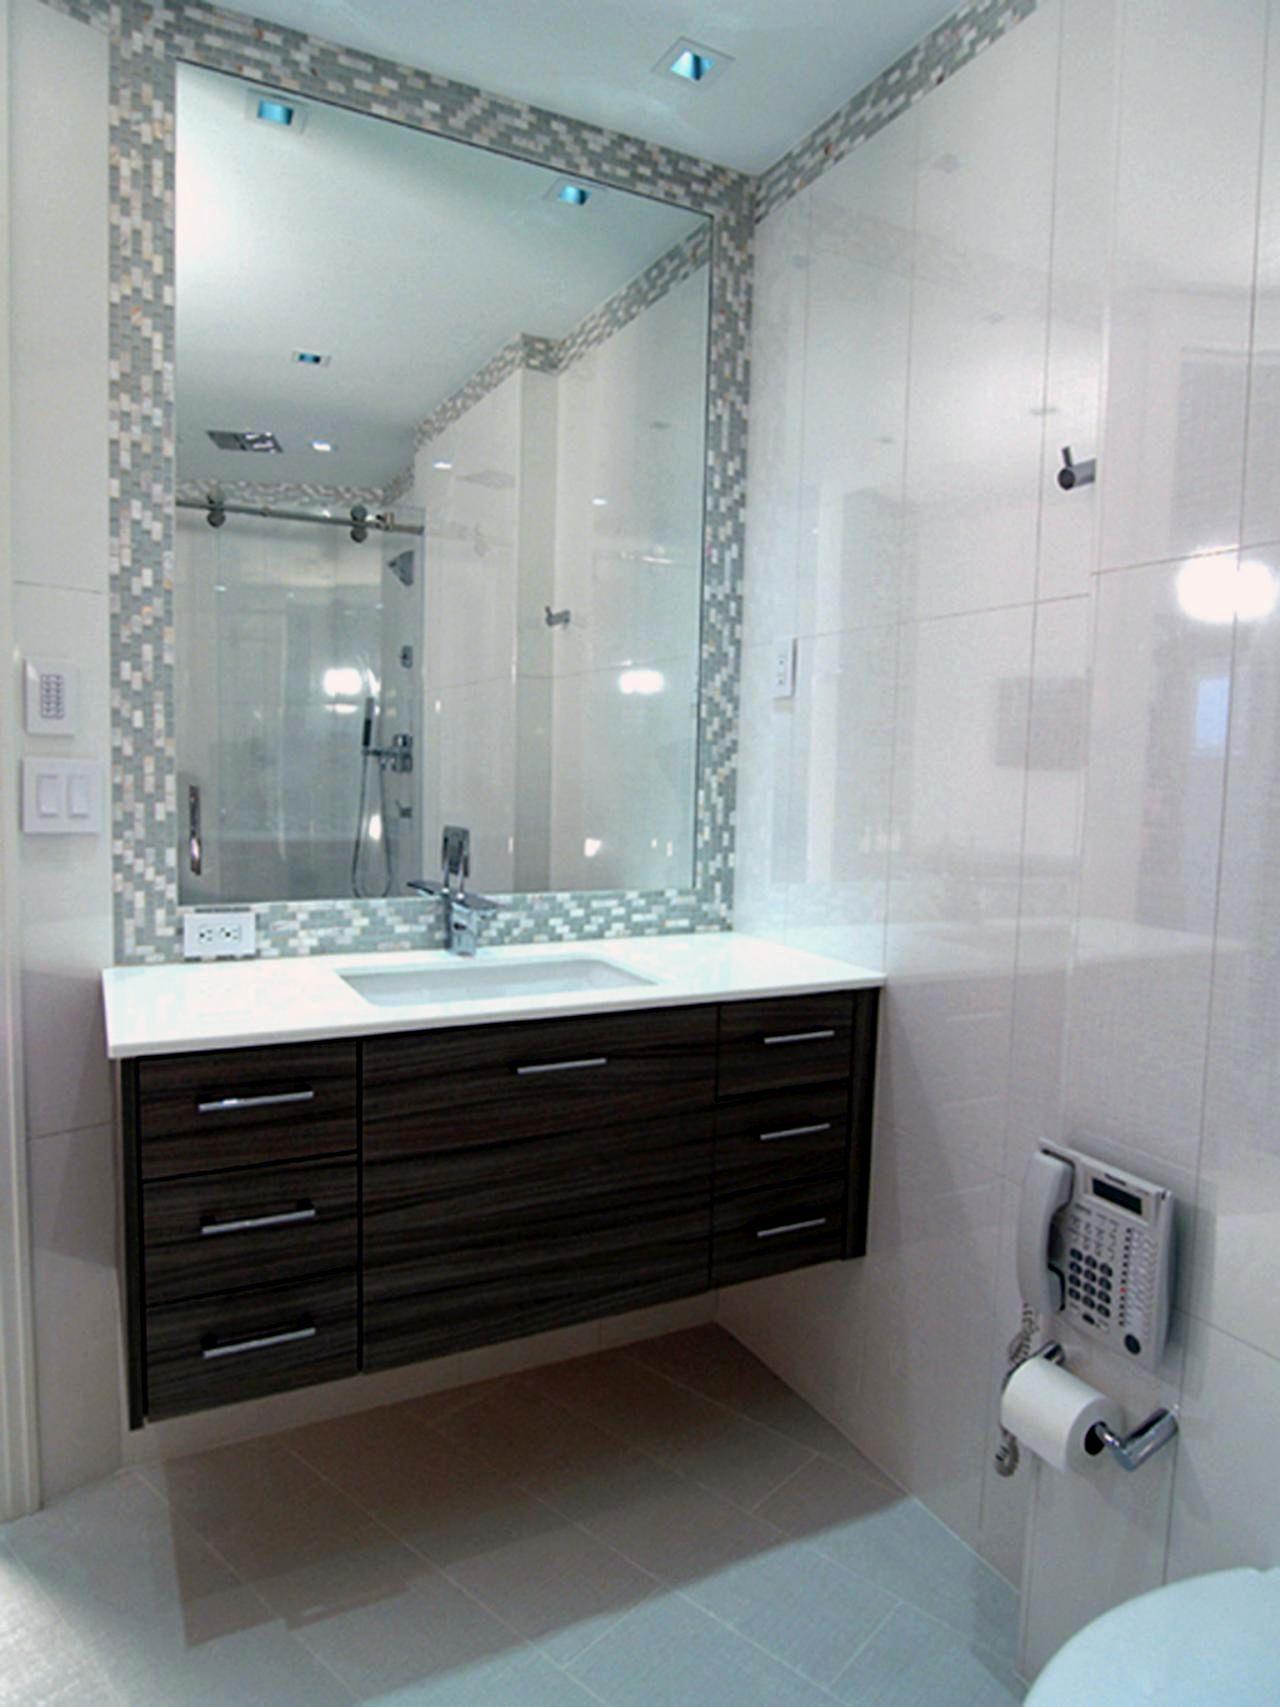 Fascinating Grey Tile Bathroom Wallpaper - Bathroom Design Ideas ...